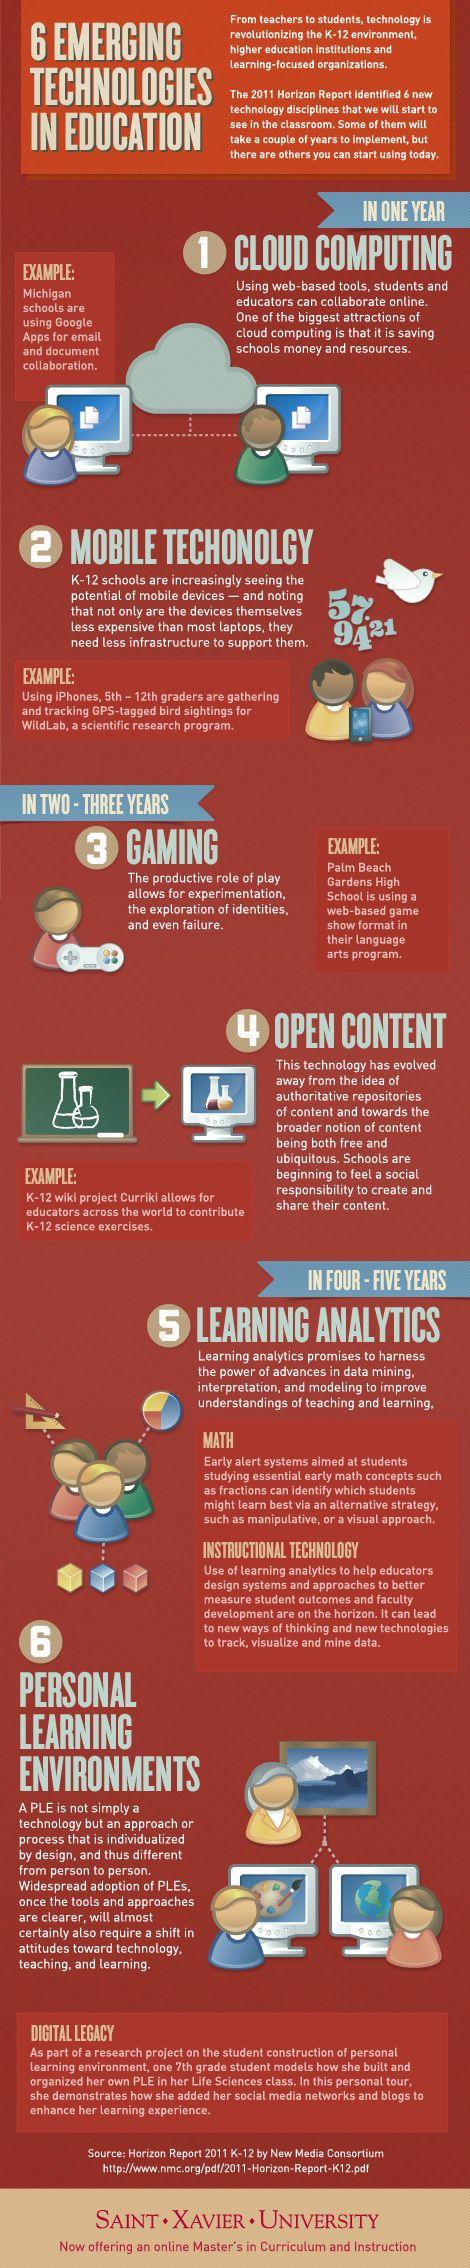 6 tecnologías emergentes en educación // Selección del blog Útopo Libre http://www.utopolibre.educahistoria.com